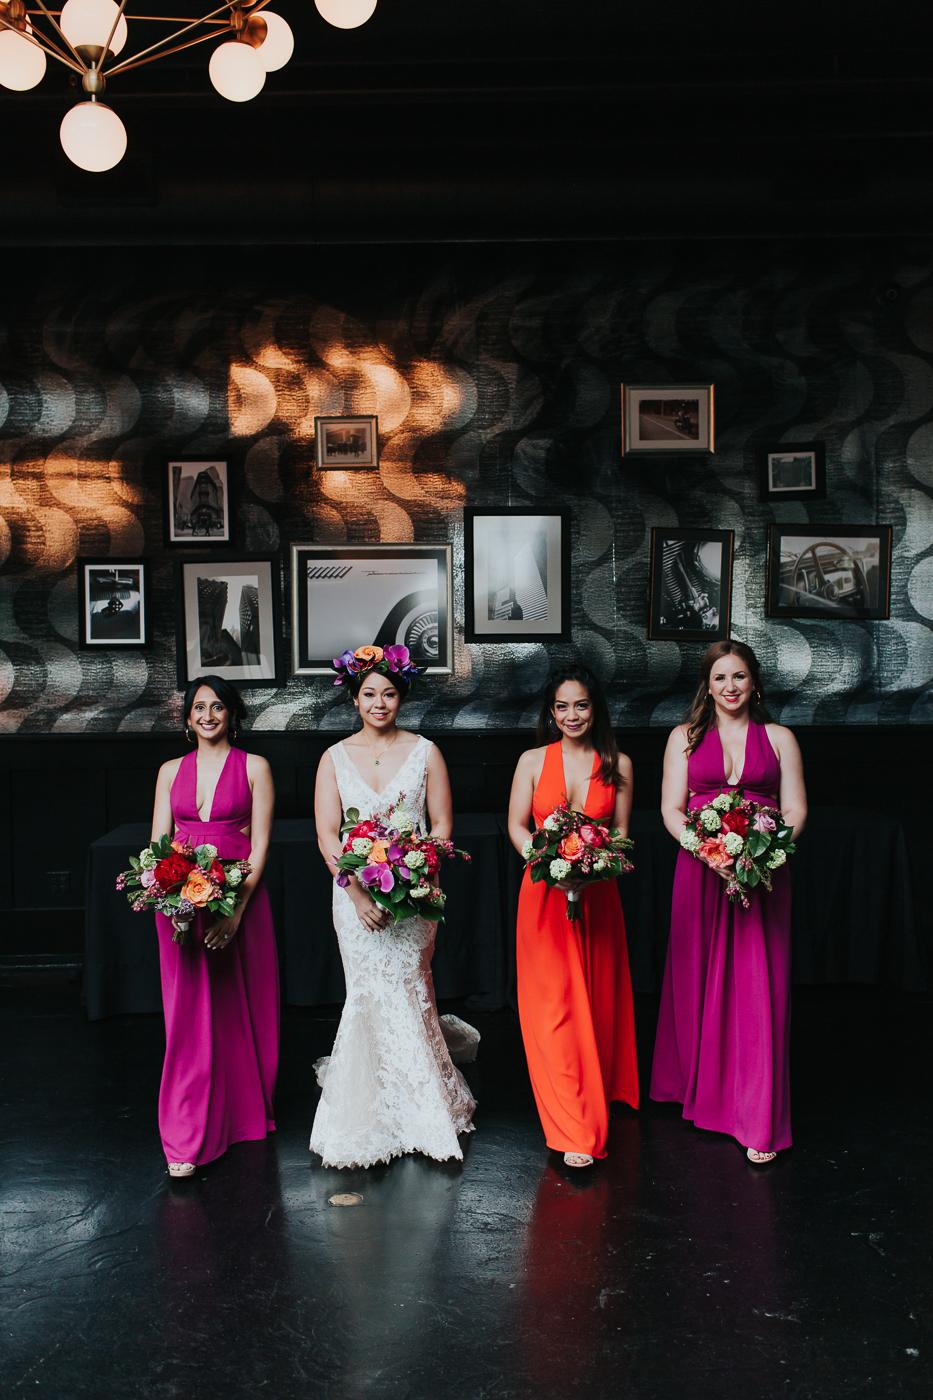 501-Union-Brooklyn-Documentary-Wedding-Photographer-51.jpg